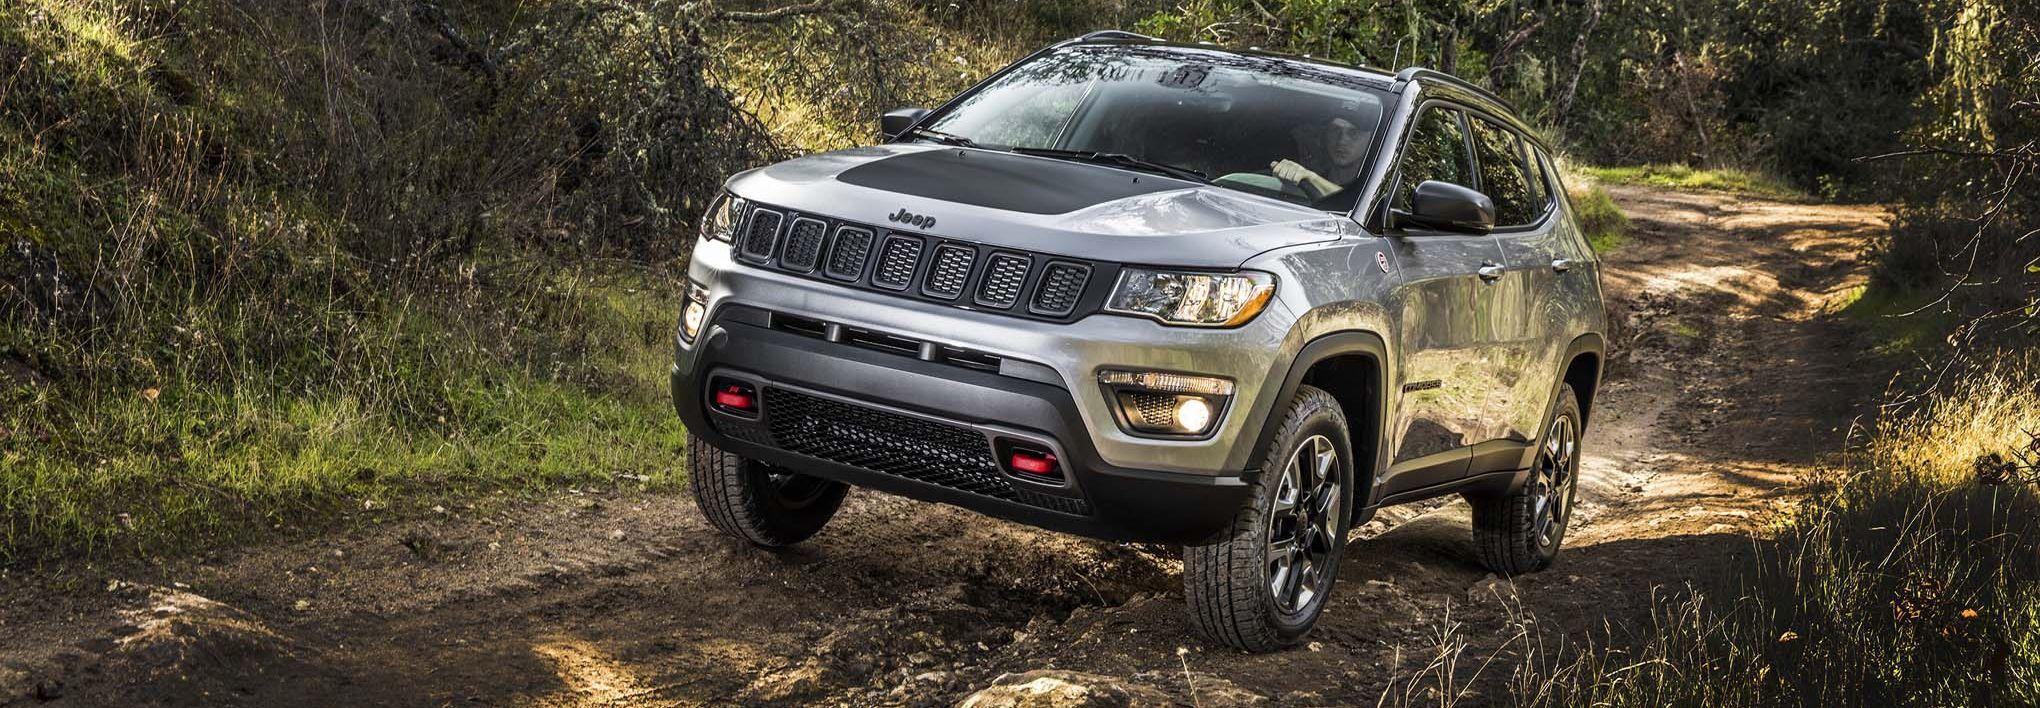 2017 jeep compass trailhawk for sale in edmonton alberta. Black Bedroom Furniture Sets. Home Design Ideas